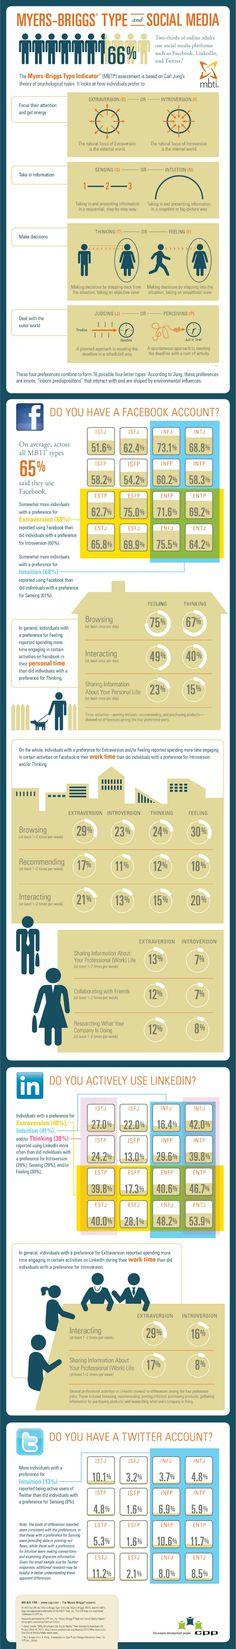 Social Media Personality Types~